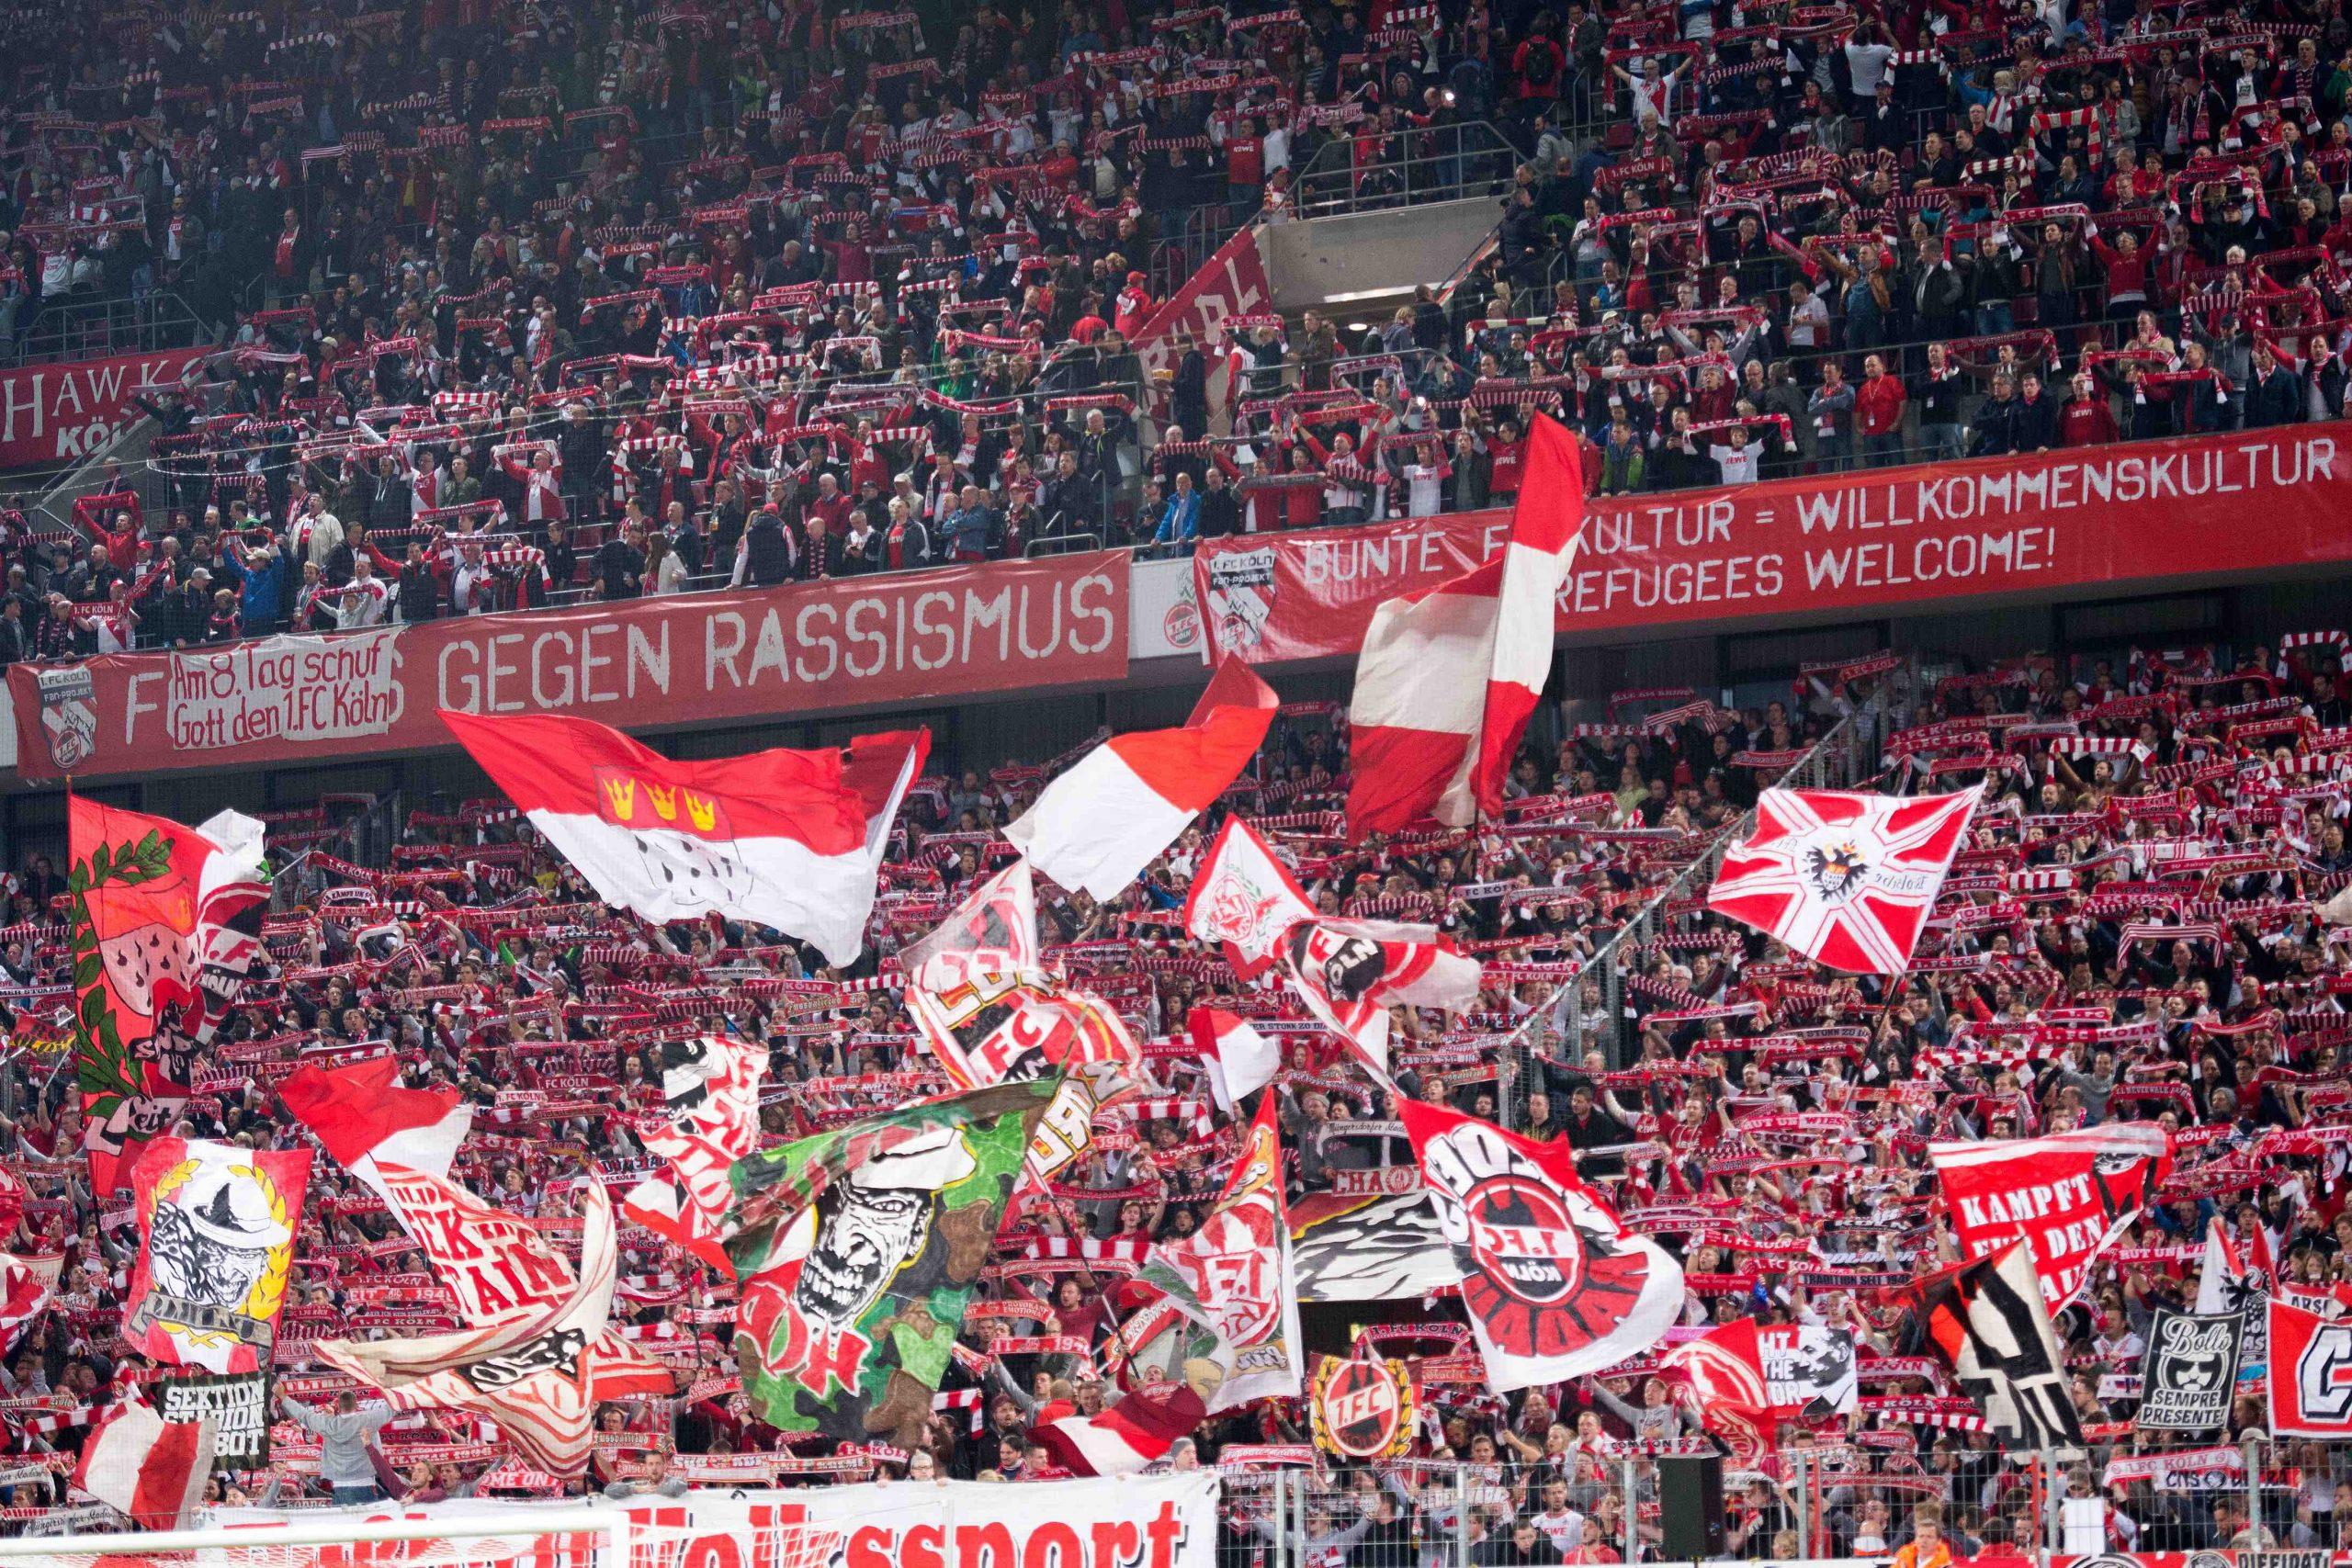 Heimspiel des 1. FC Köln gegen Ingolstadt im September 2015 Foto: dpa